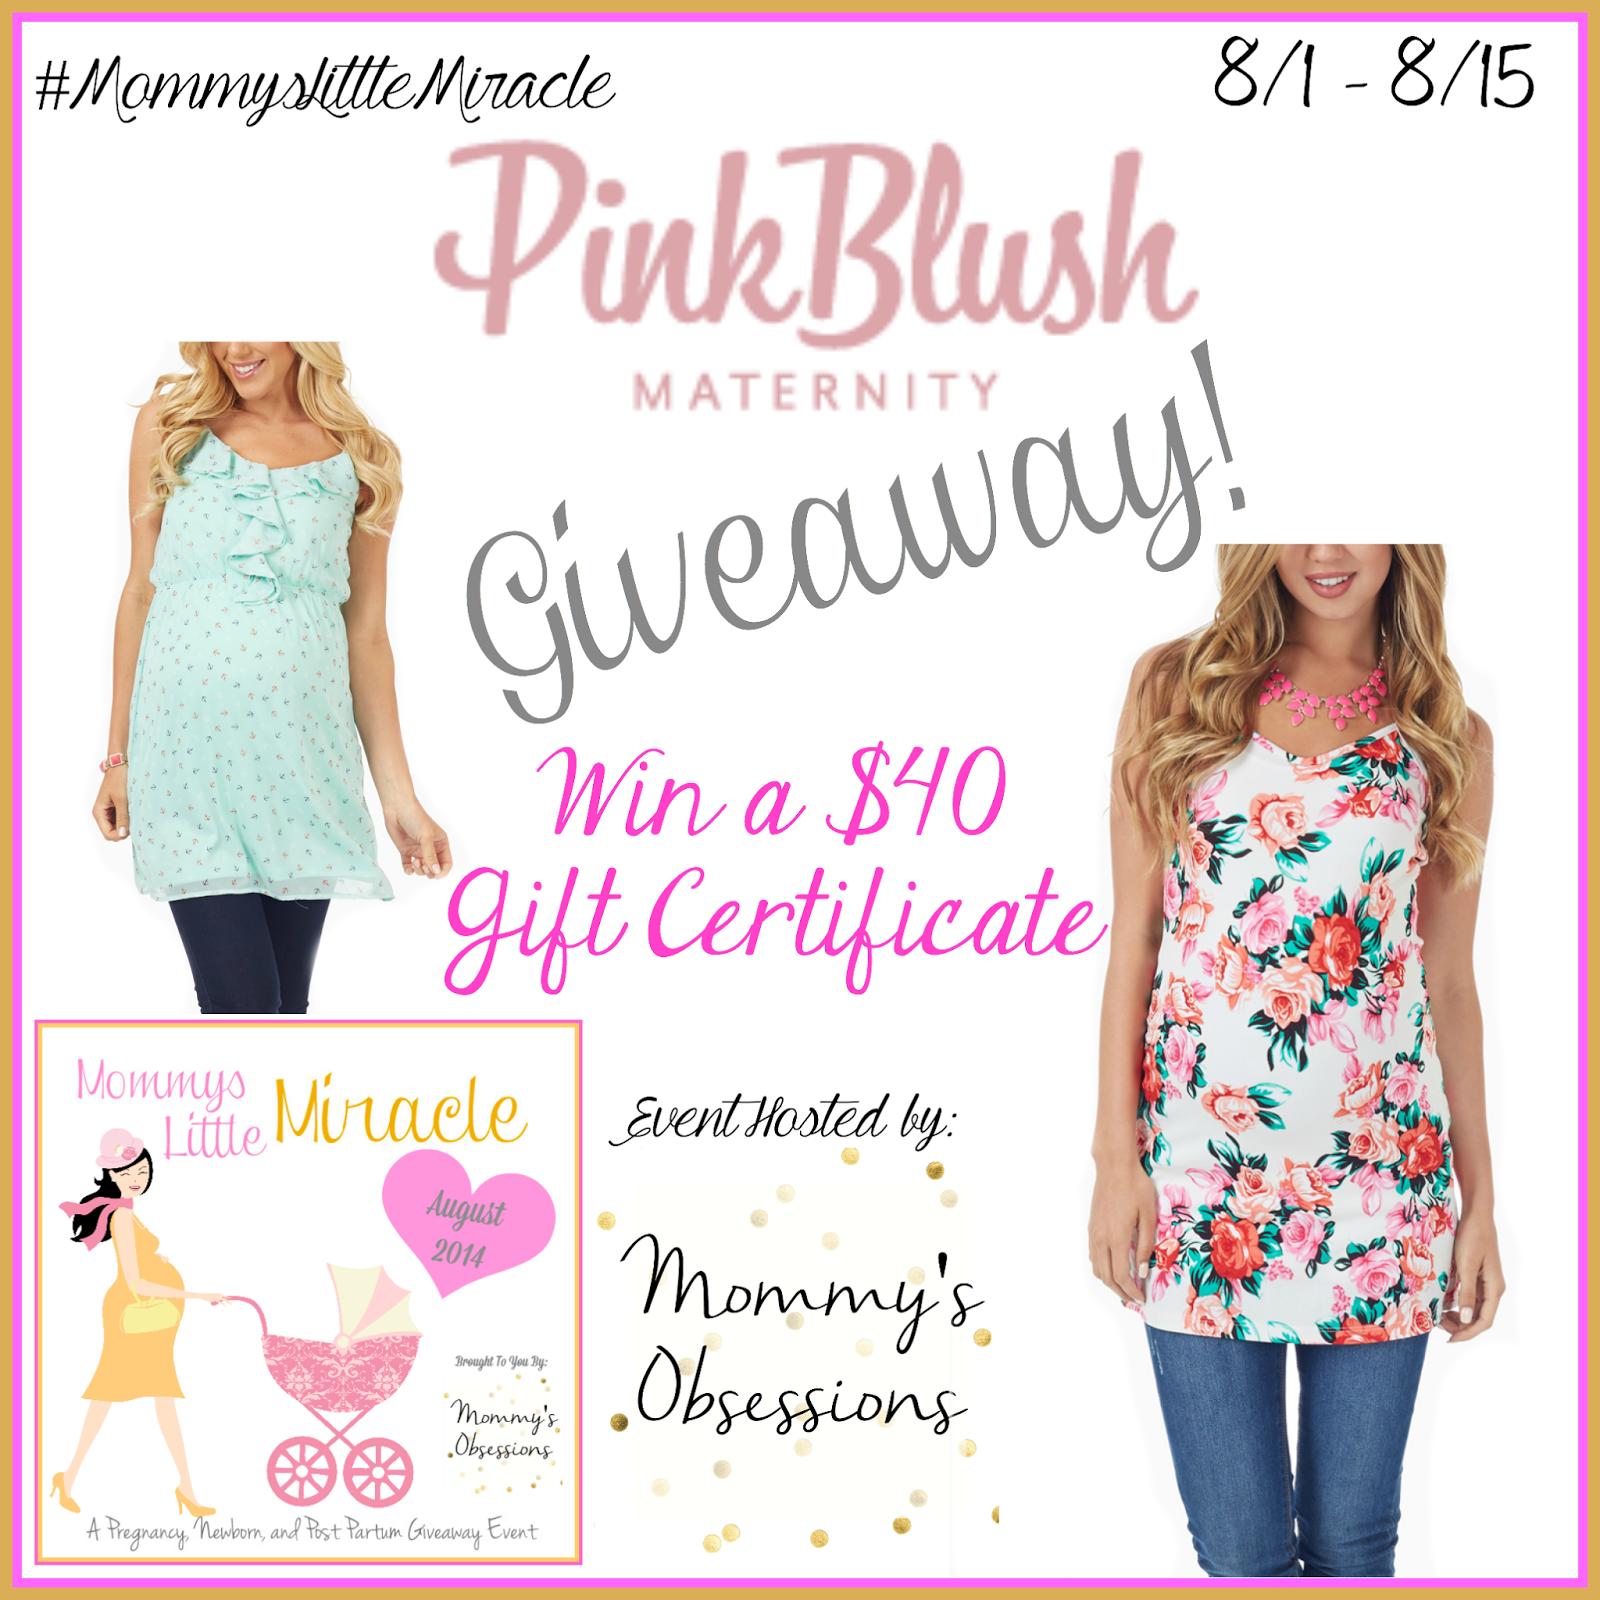 Pink Blush Maternity Giveaway